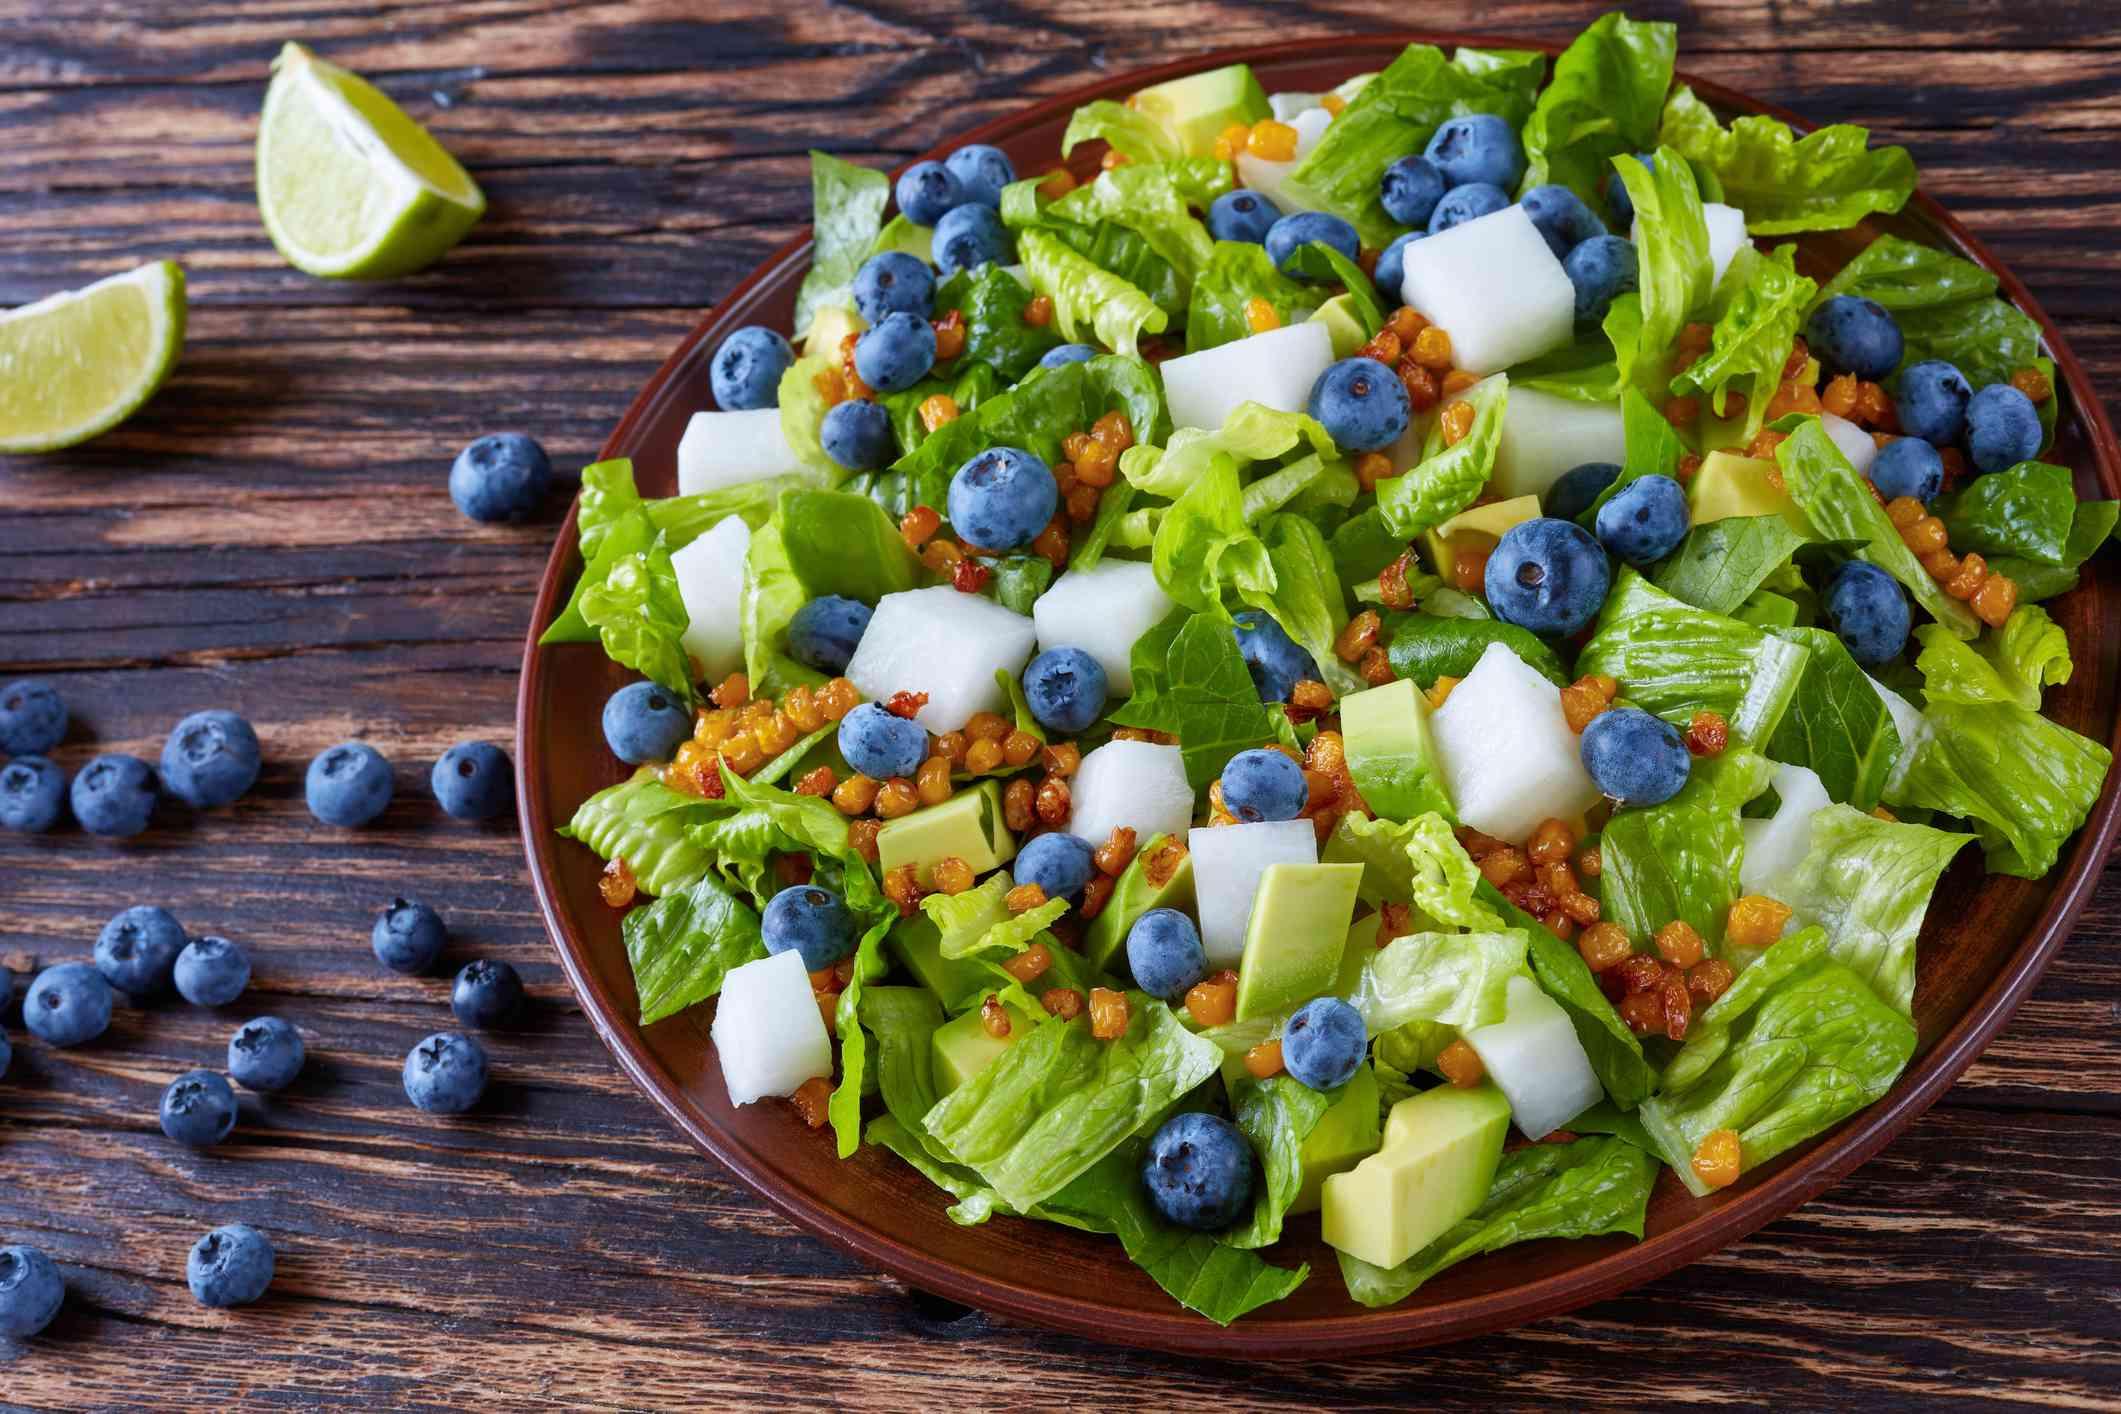 Salad with romaine, jicama, avocado and blueberries